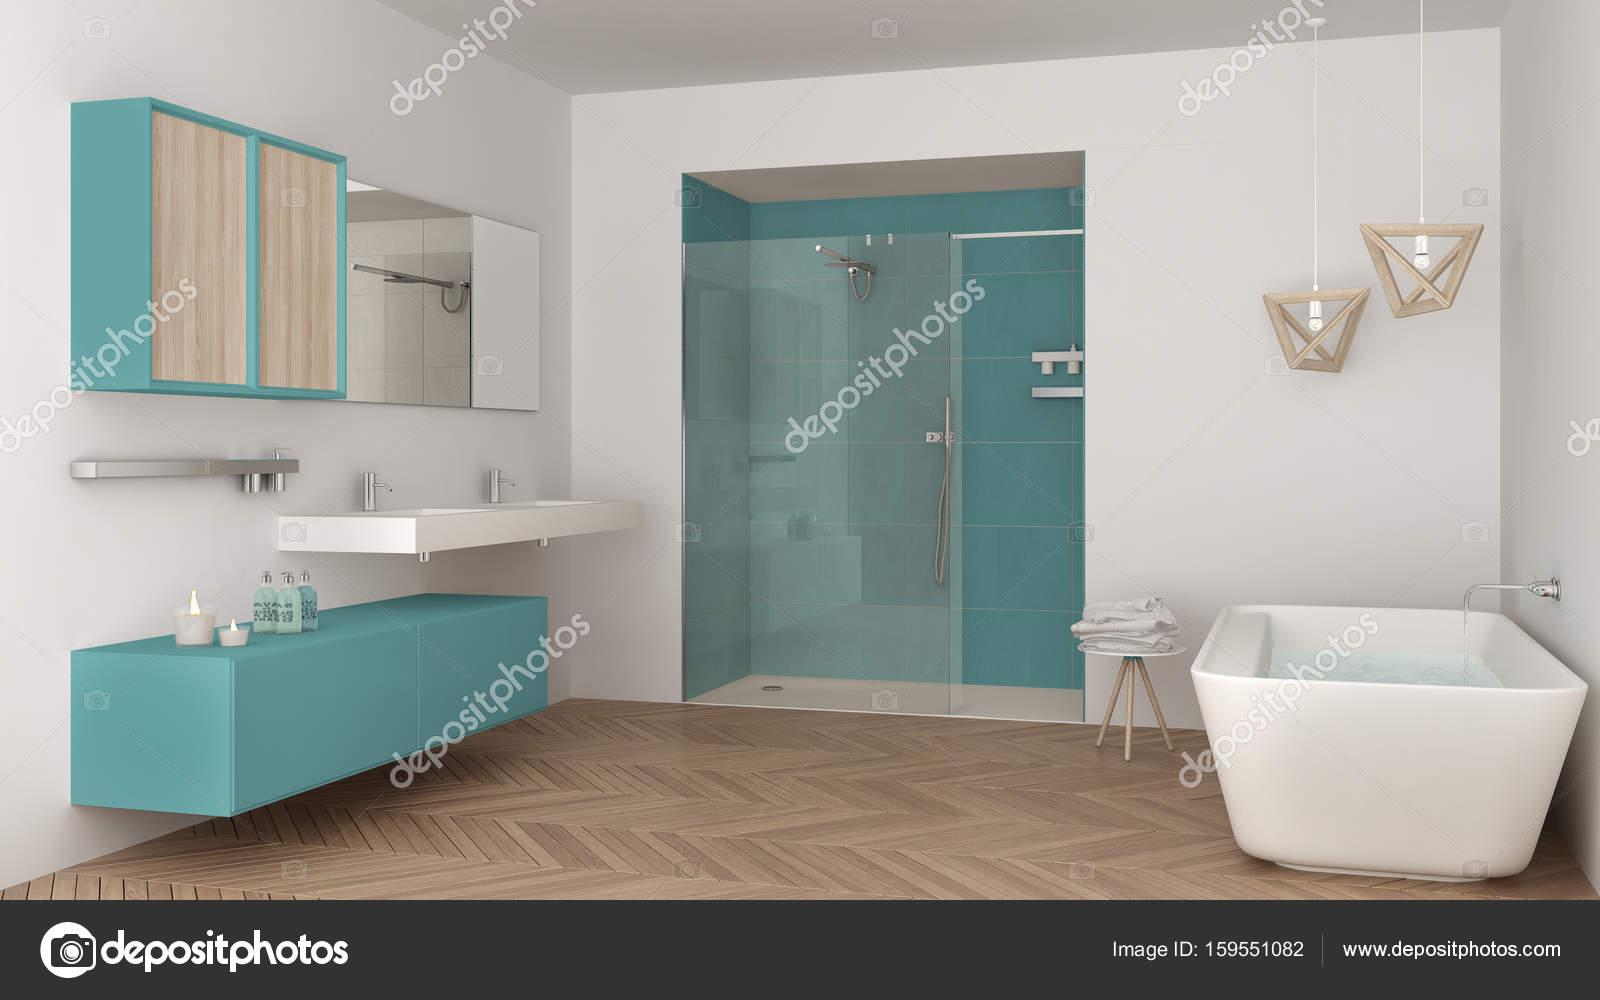 Vasca Da Bagno Con Lavabo : Arco arredo art design in dupont™ corian lavabi da bagno in